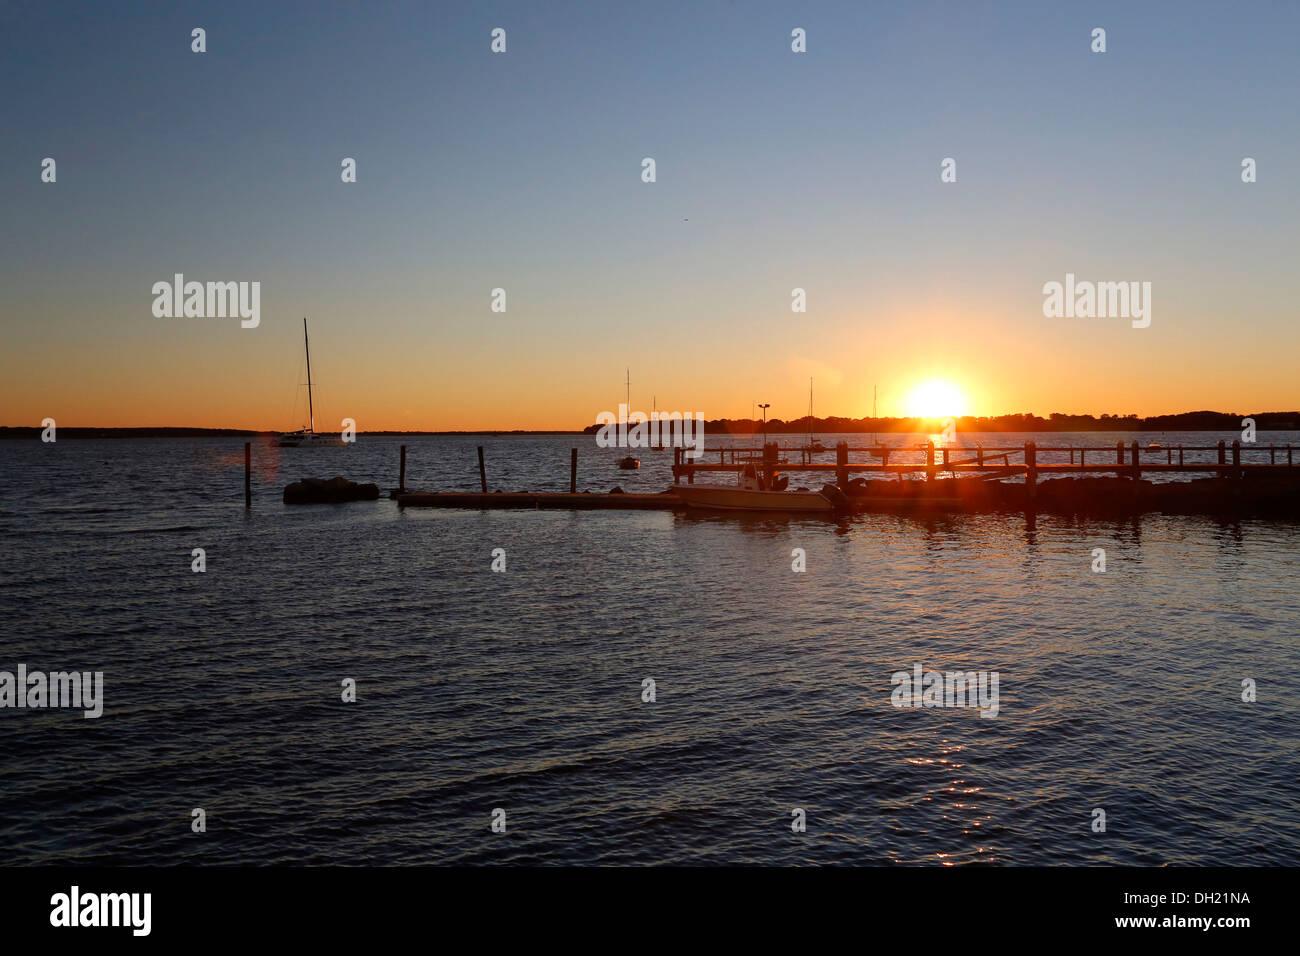 Bristol harbour at sunset, Rhode Island, USA - Stock Image